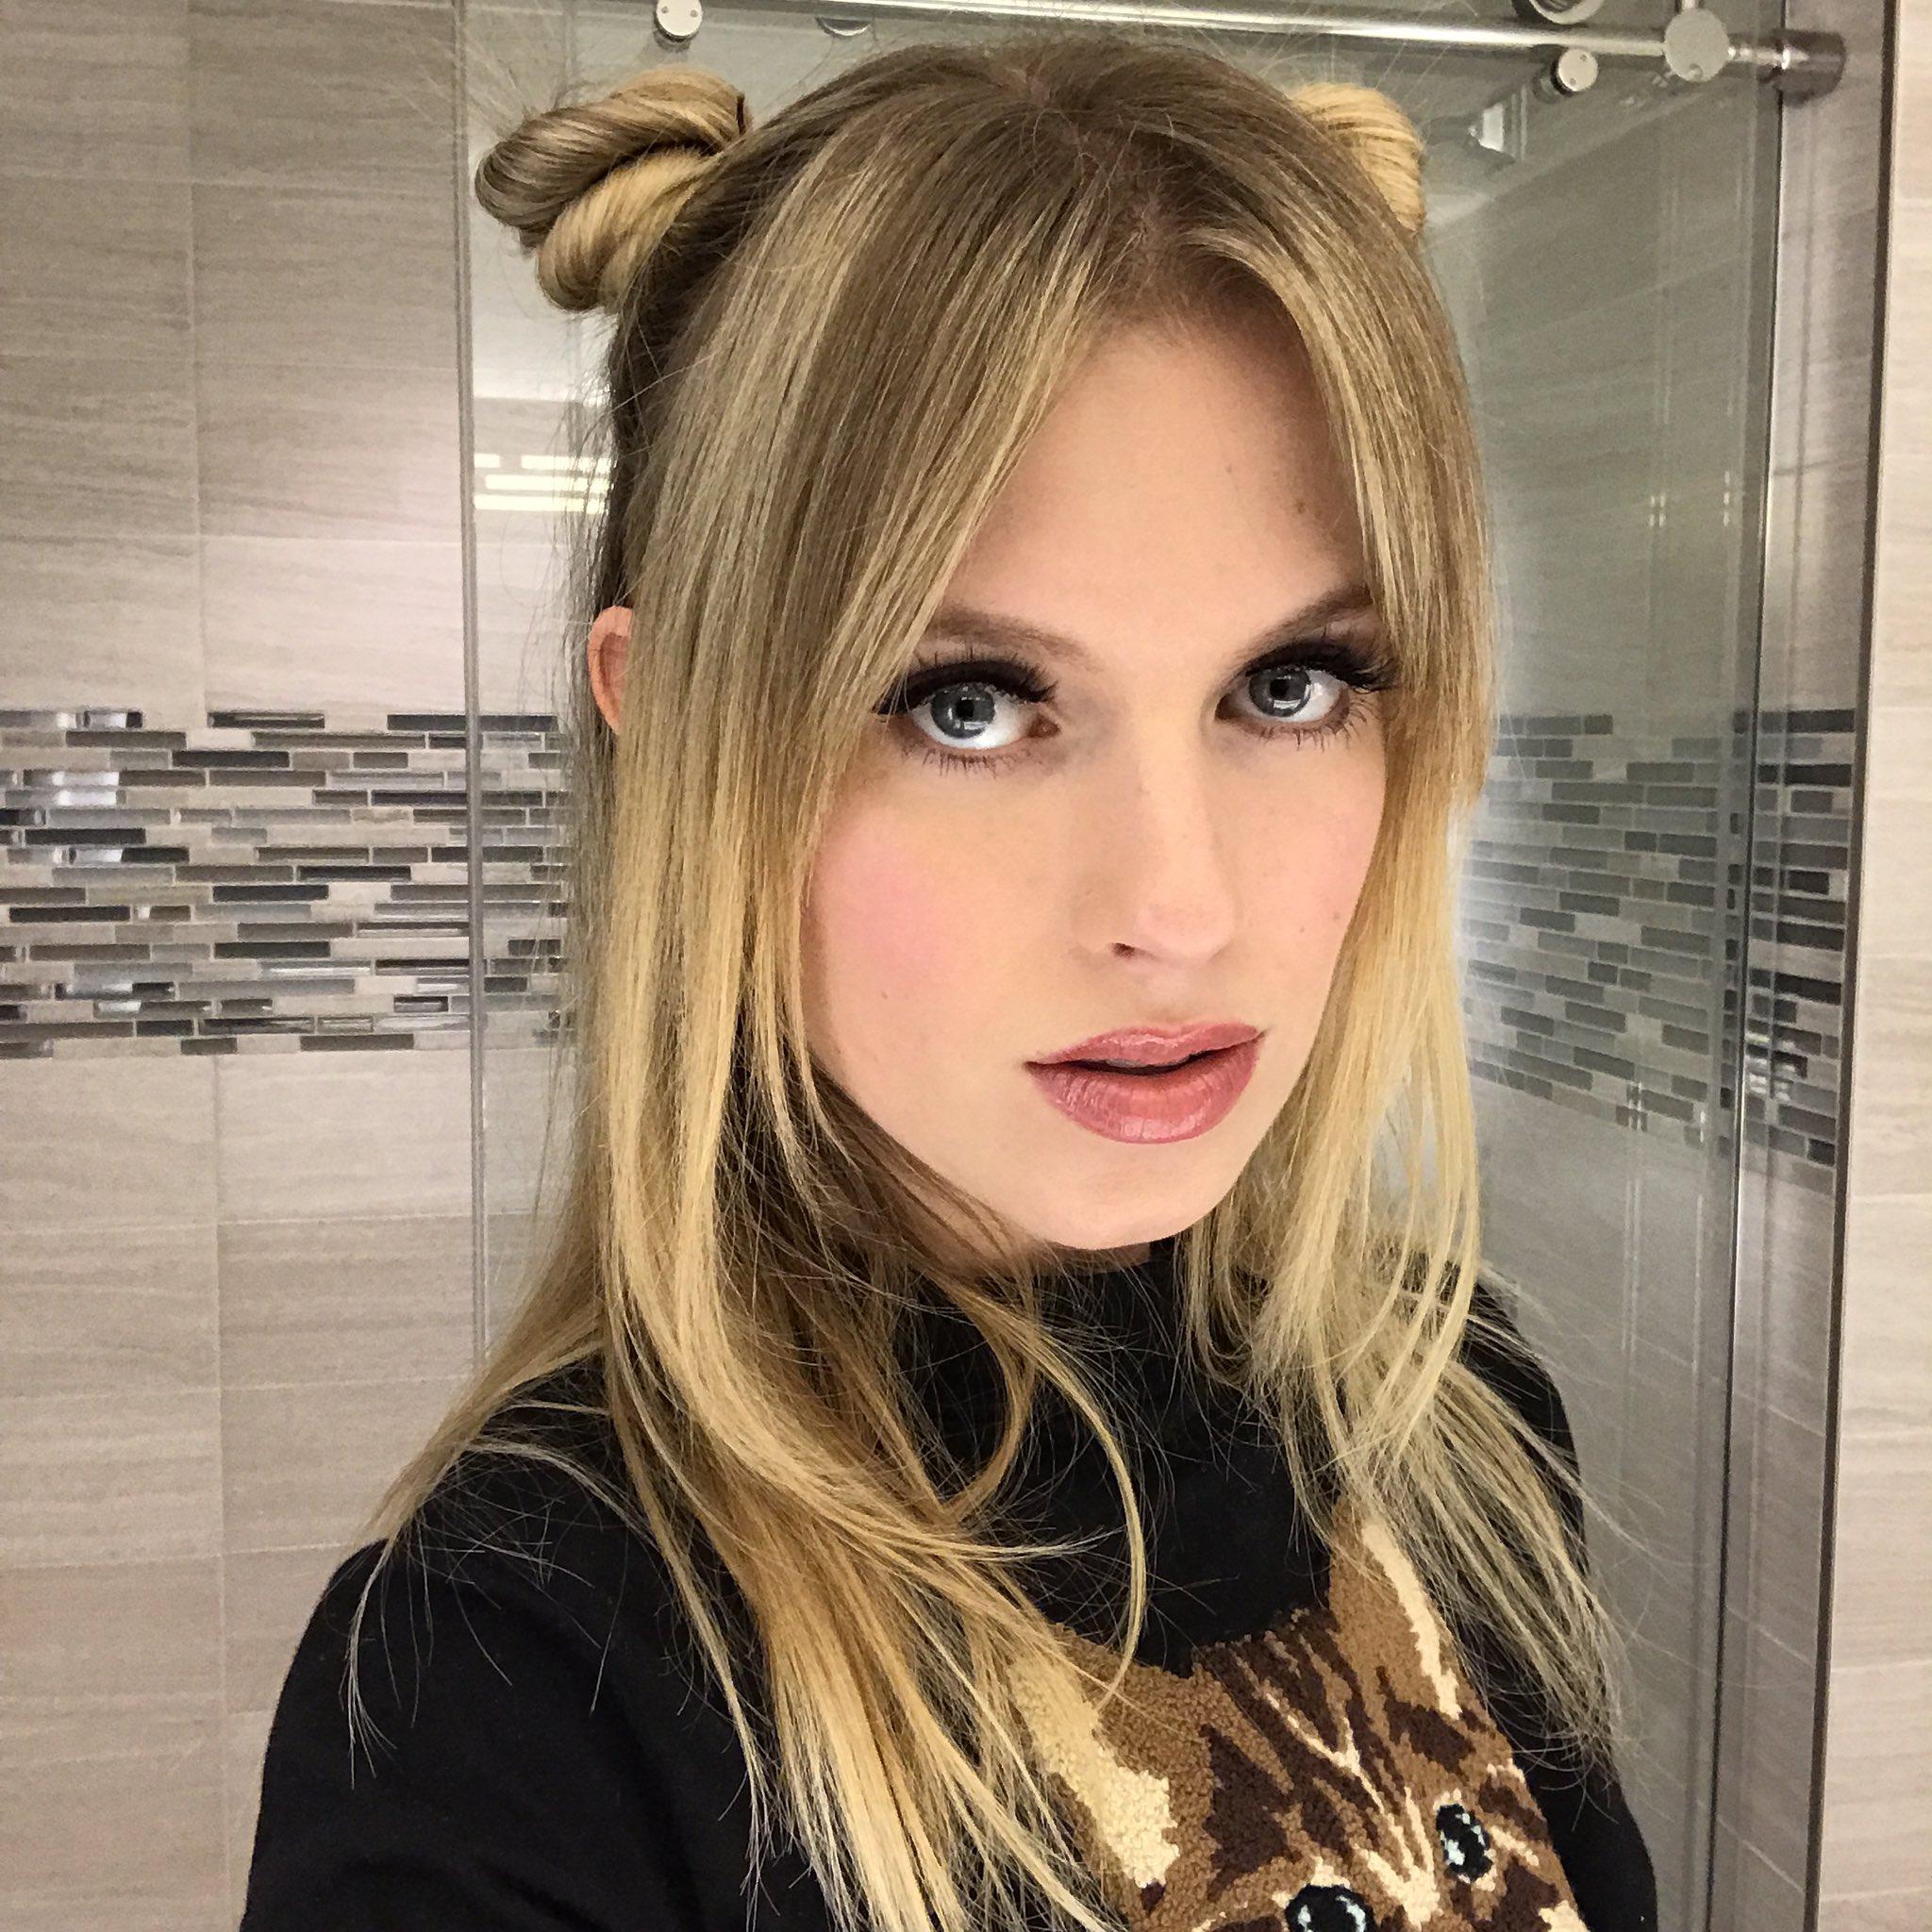 Barbara dunkelman porn